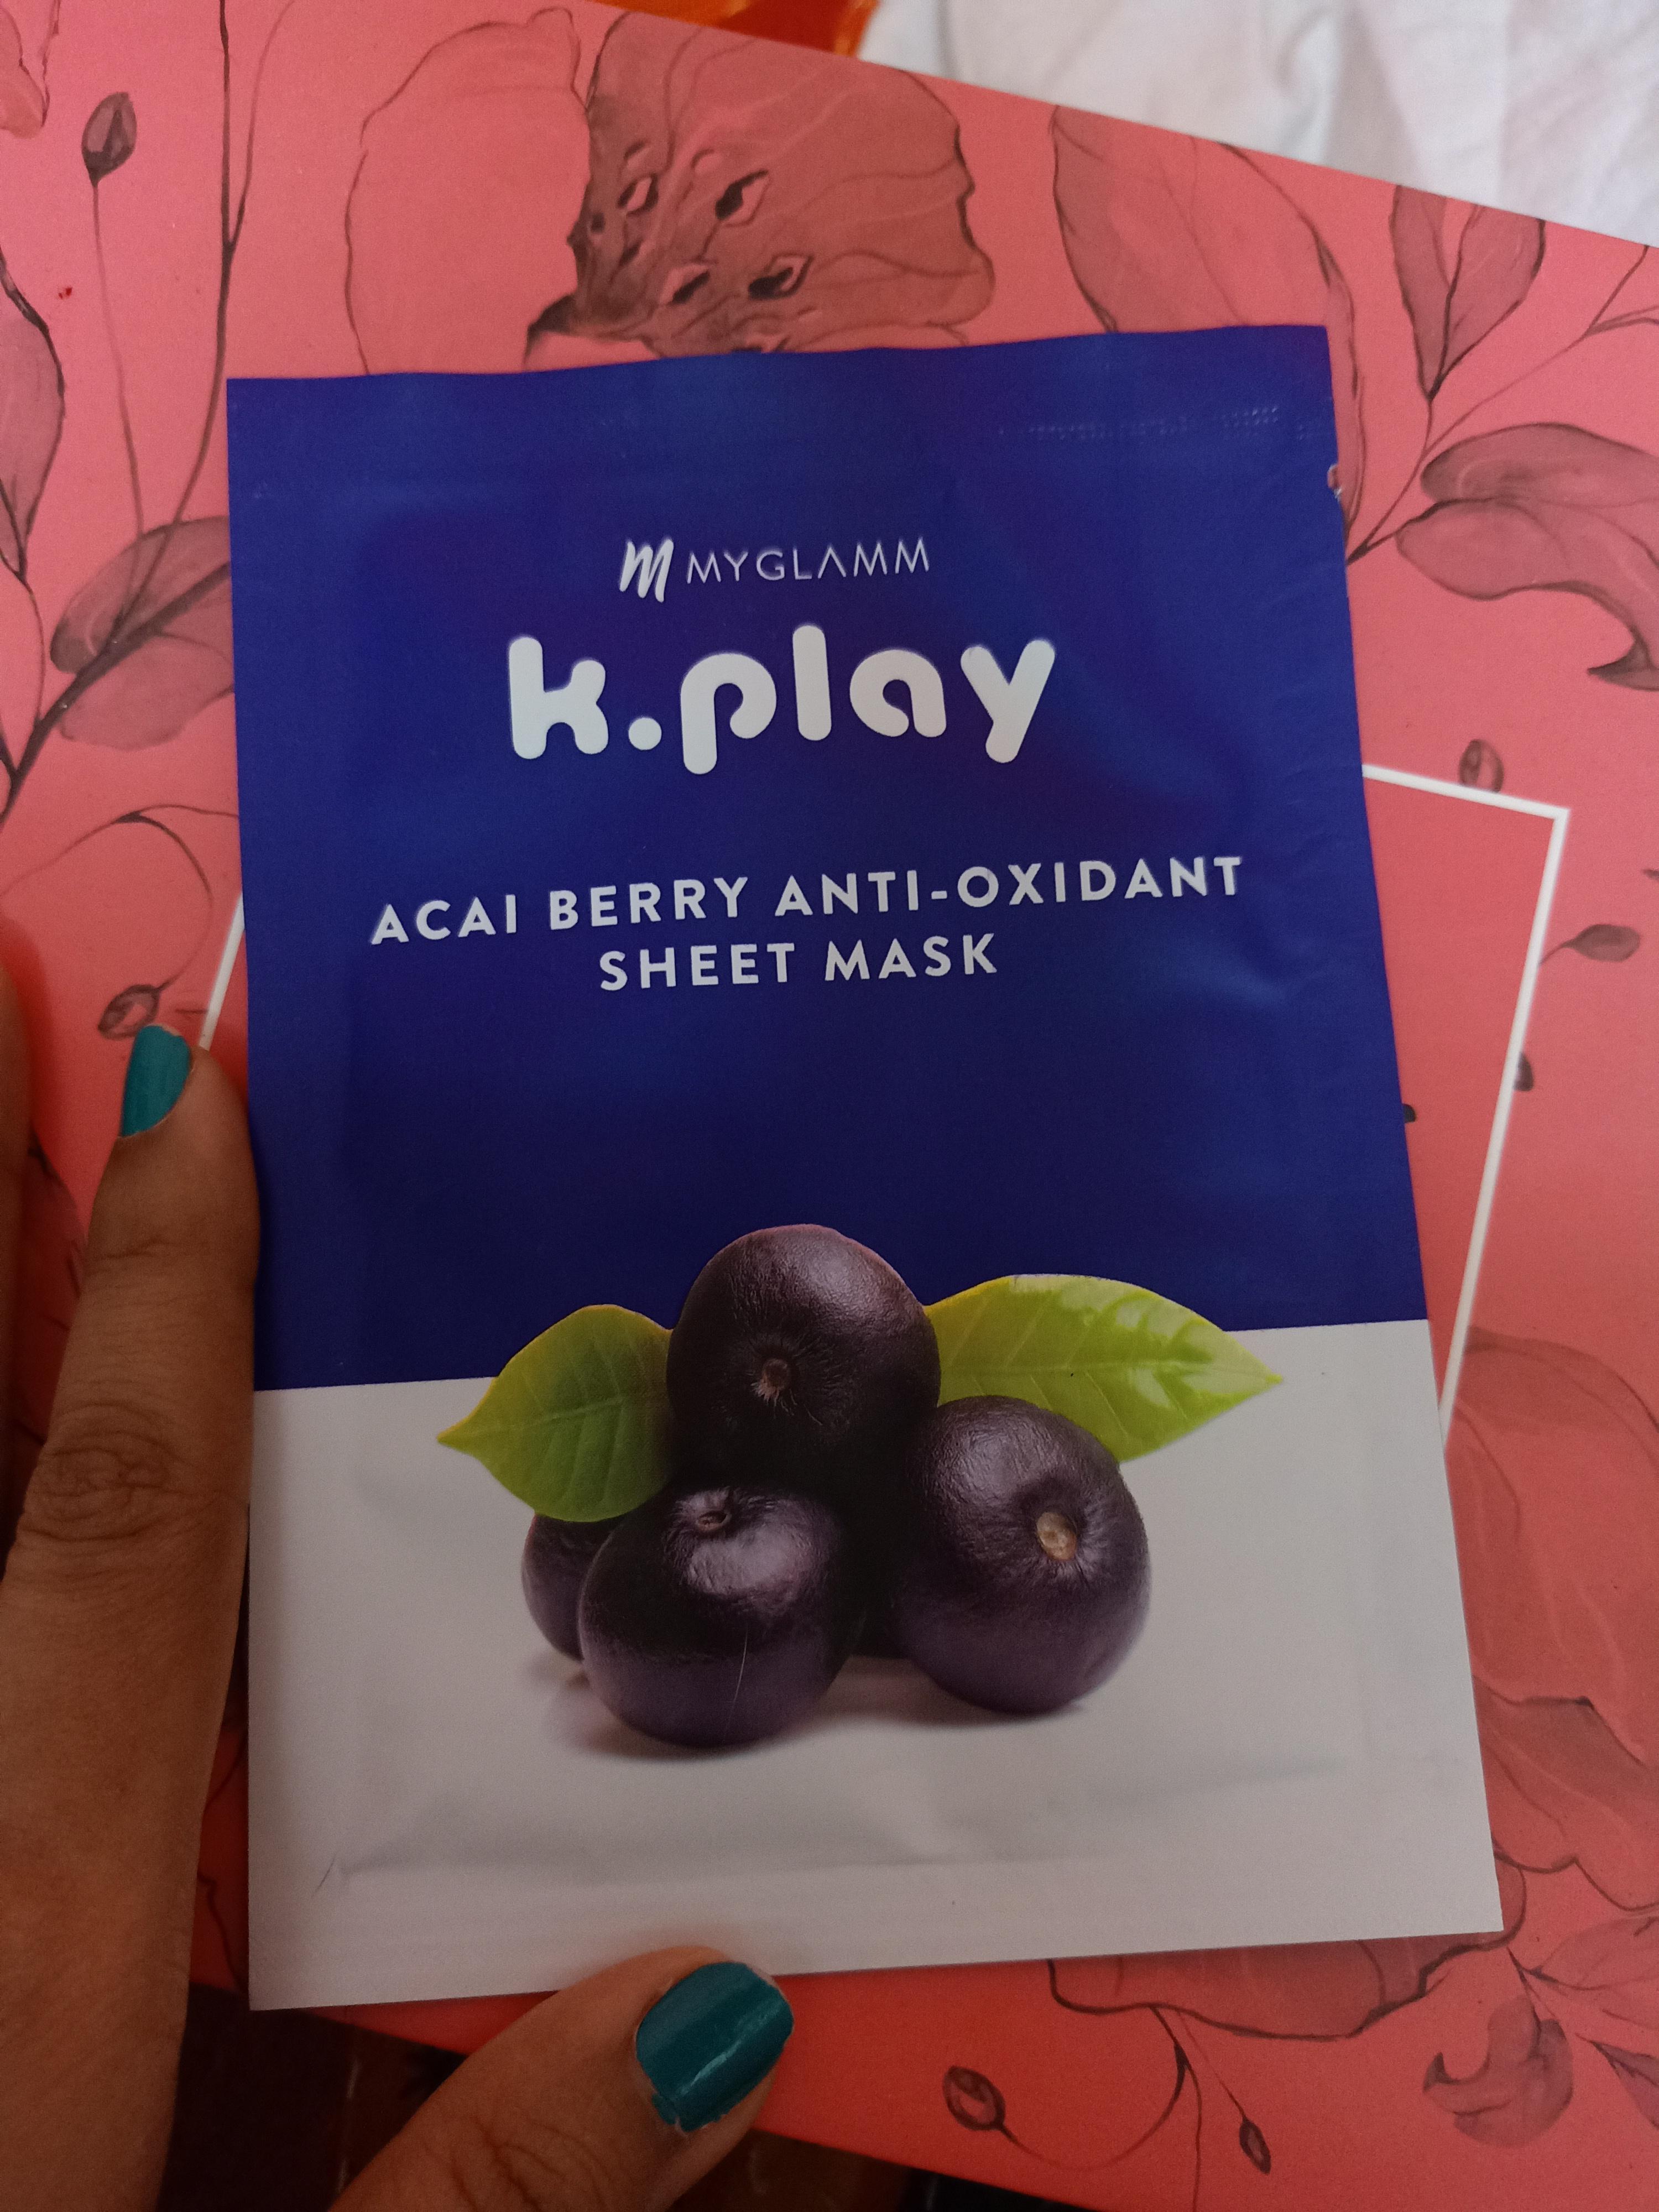 MyGlamm K.Play Acai Berry Anti-Oxidant Sheet Mask-healthy and soft skin-By tulika_shaw